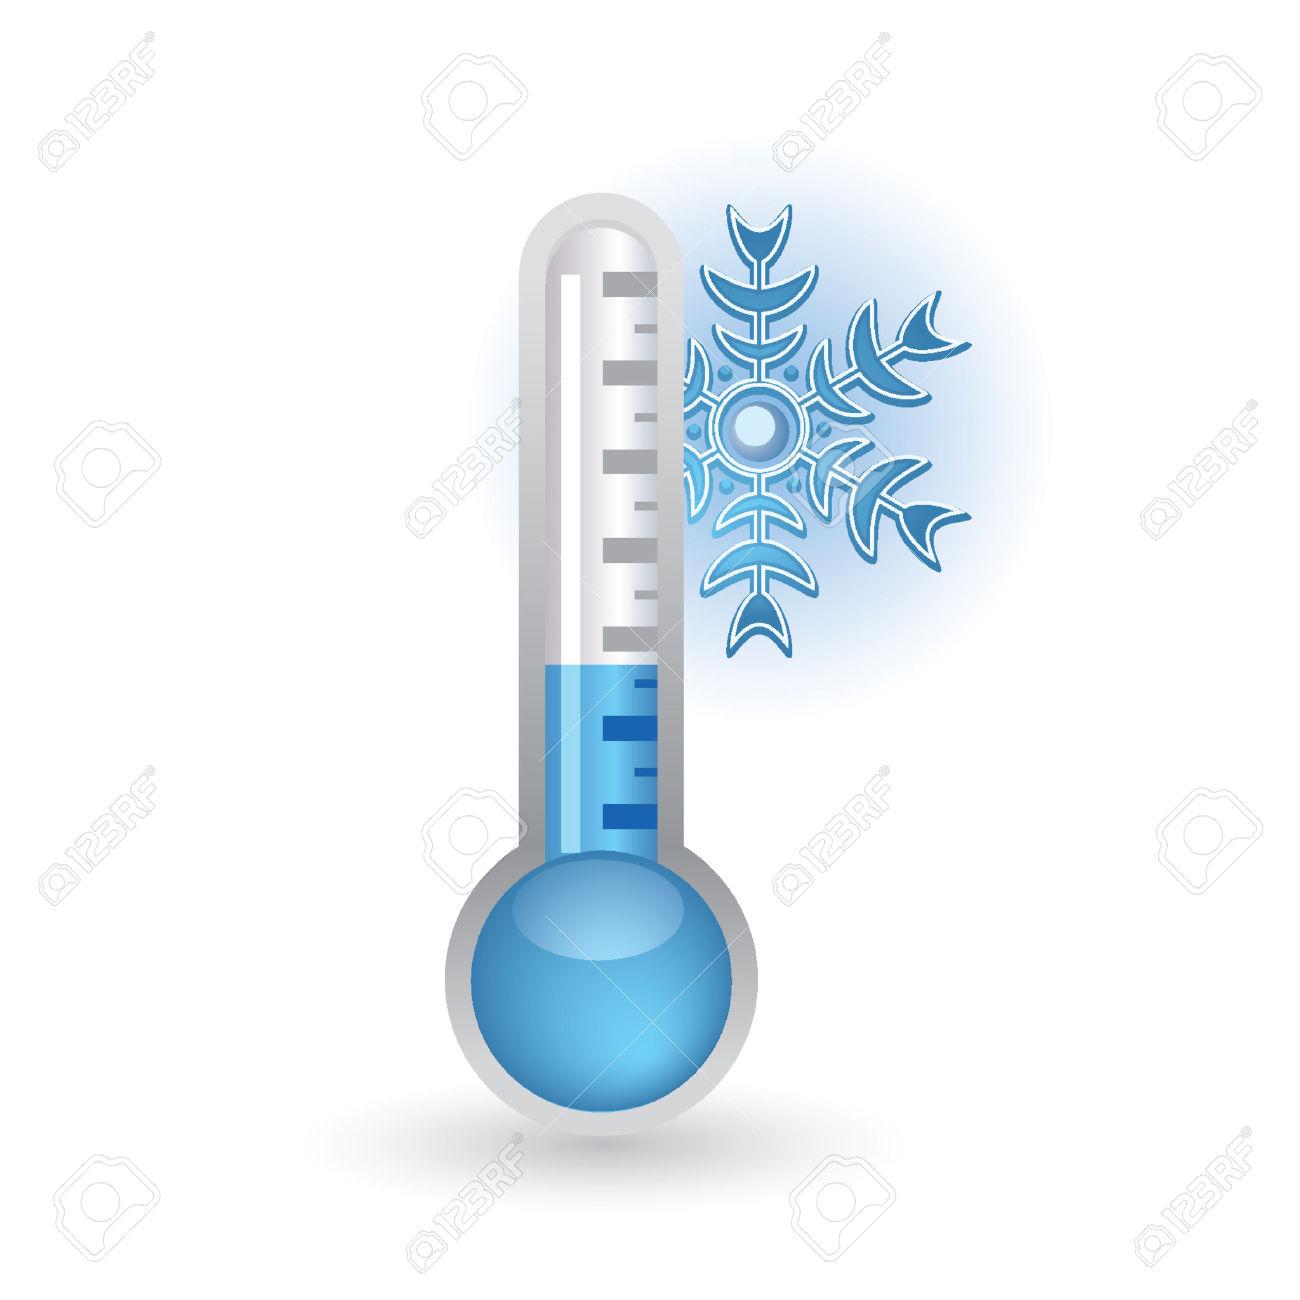 Clipart thermometer winter. Cold temperature weather clip